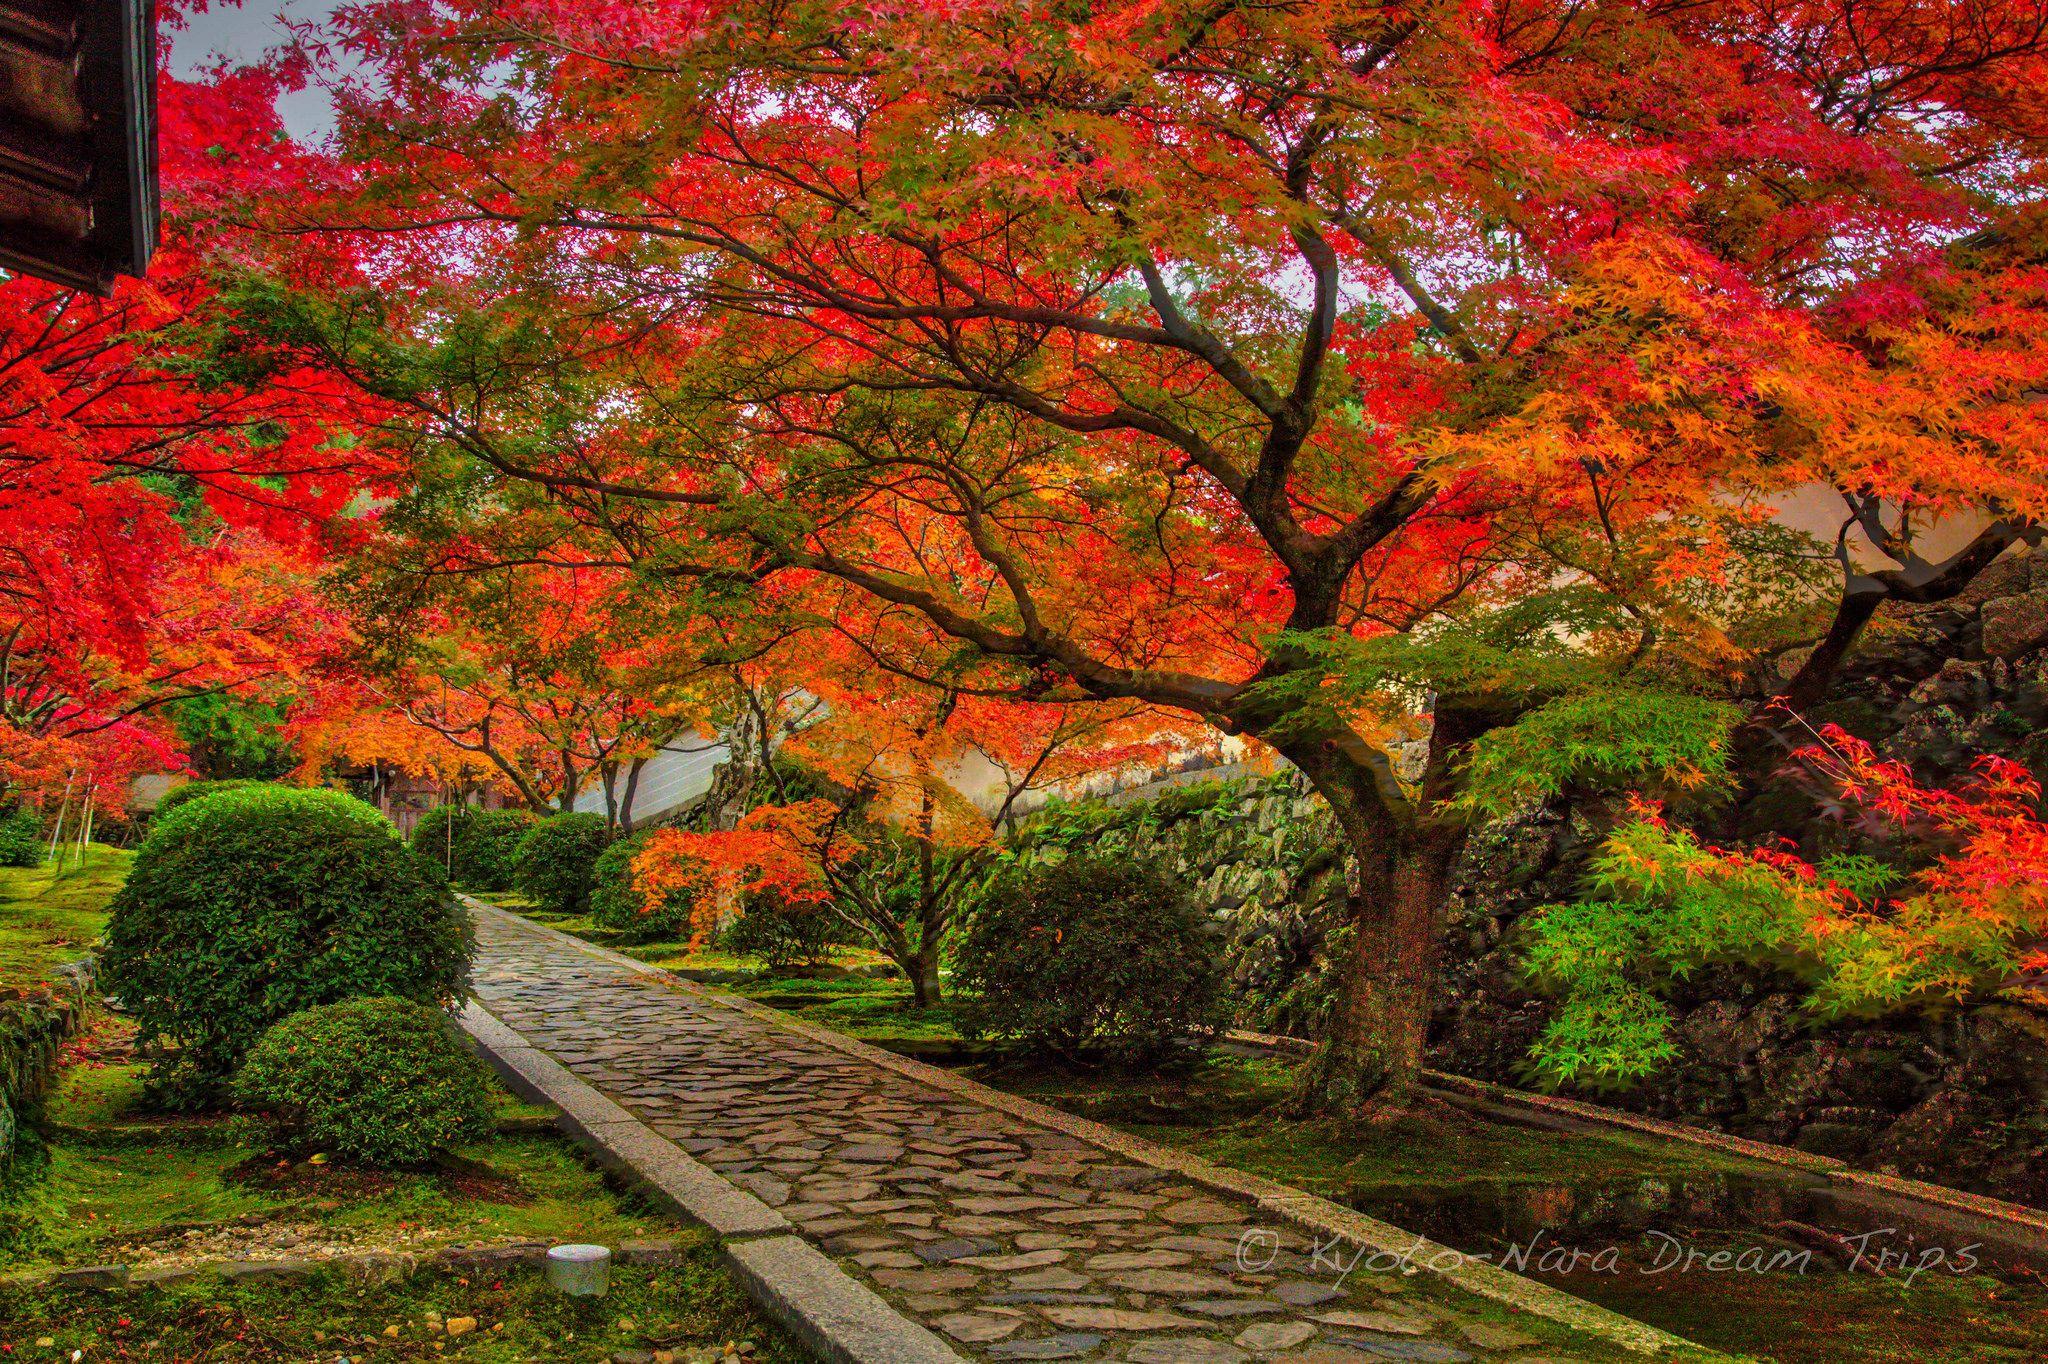 https://flic.kr/p/PhR9WP | Shūon-an Ikkyū-ji, Autumn Buzz in Kyotanabe, Japan. | The approach to the Shūon-an Ikkyū-ji (酬恩庵一休寺) temple, in Kyotanabe, Kyoto. It feels like walking under an umbrella of red crimson maple leafs.